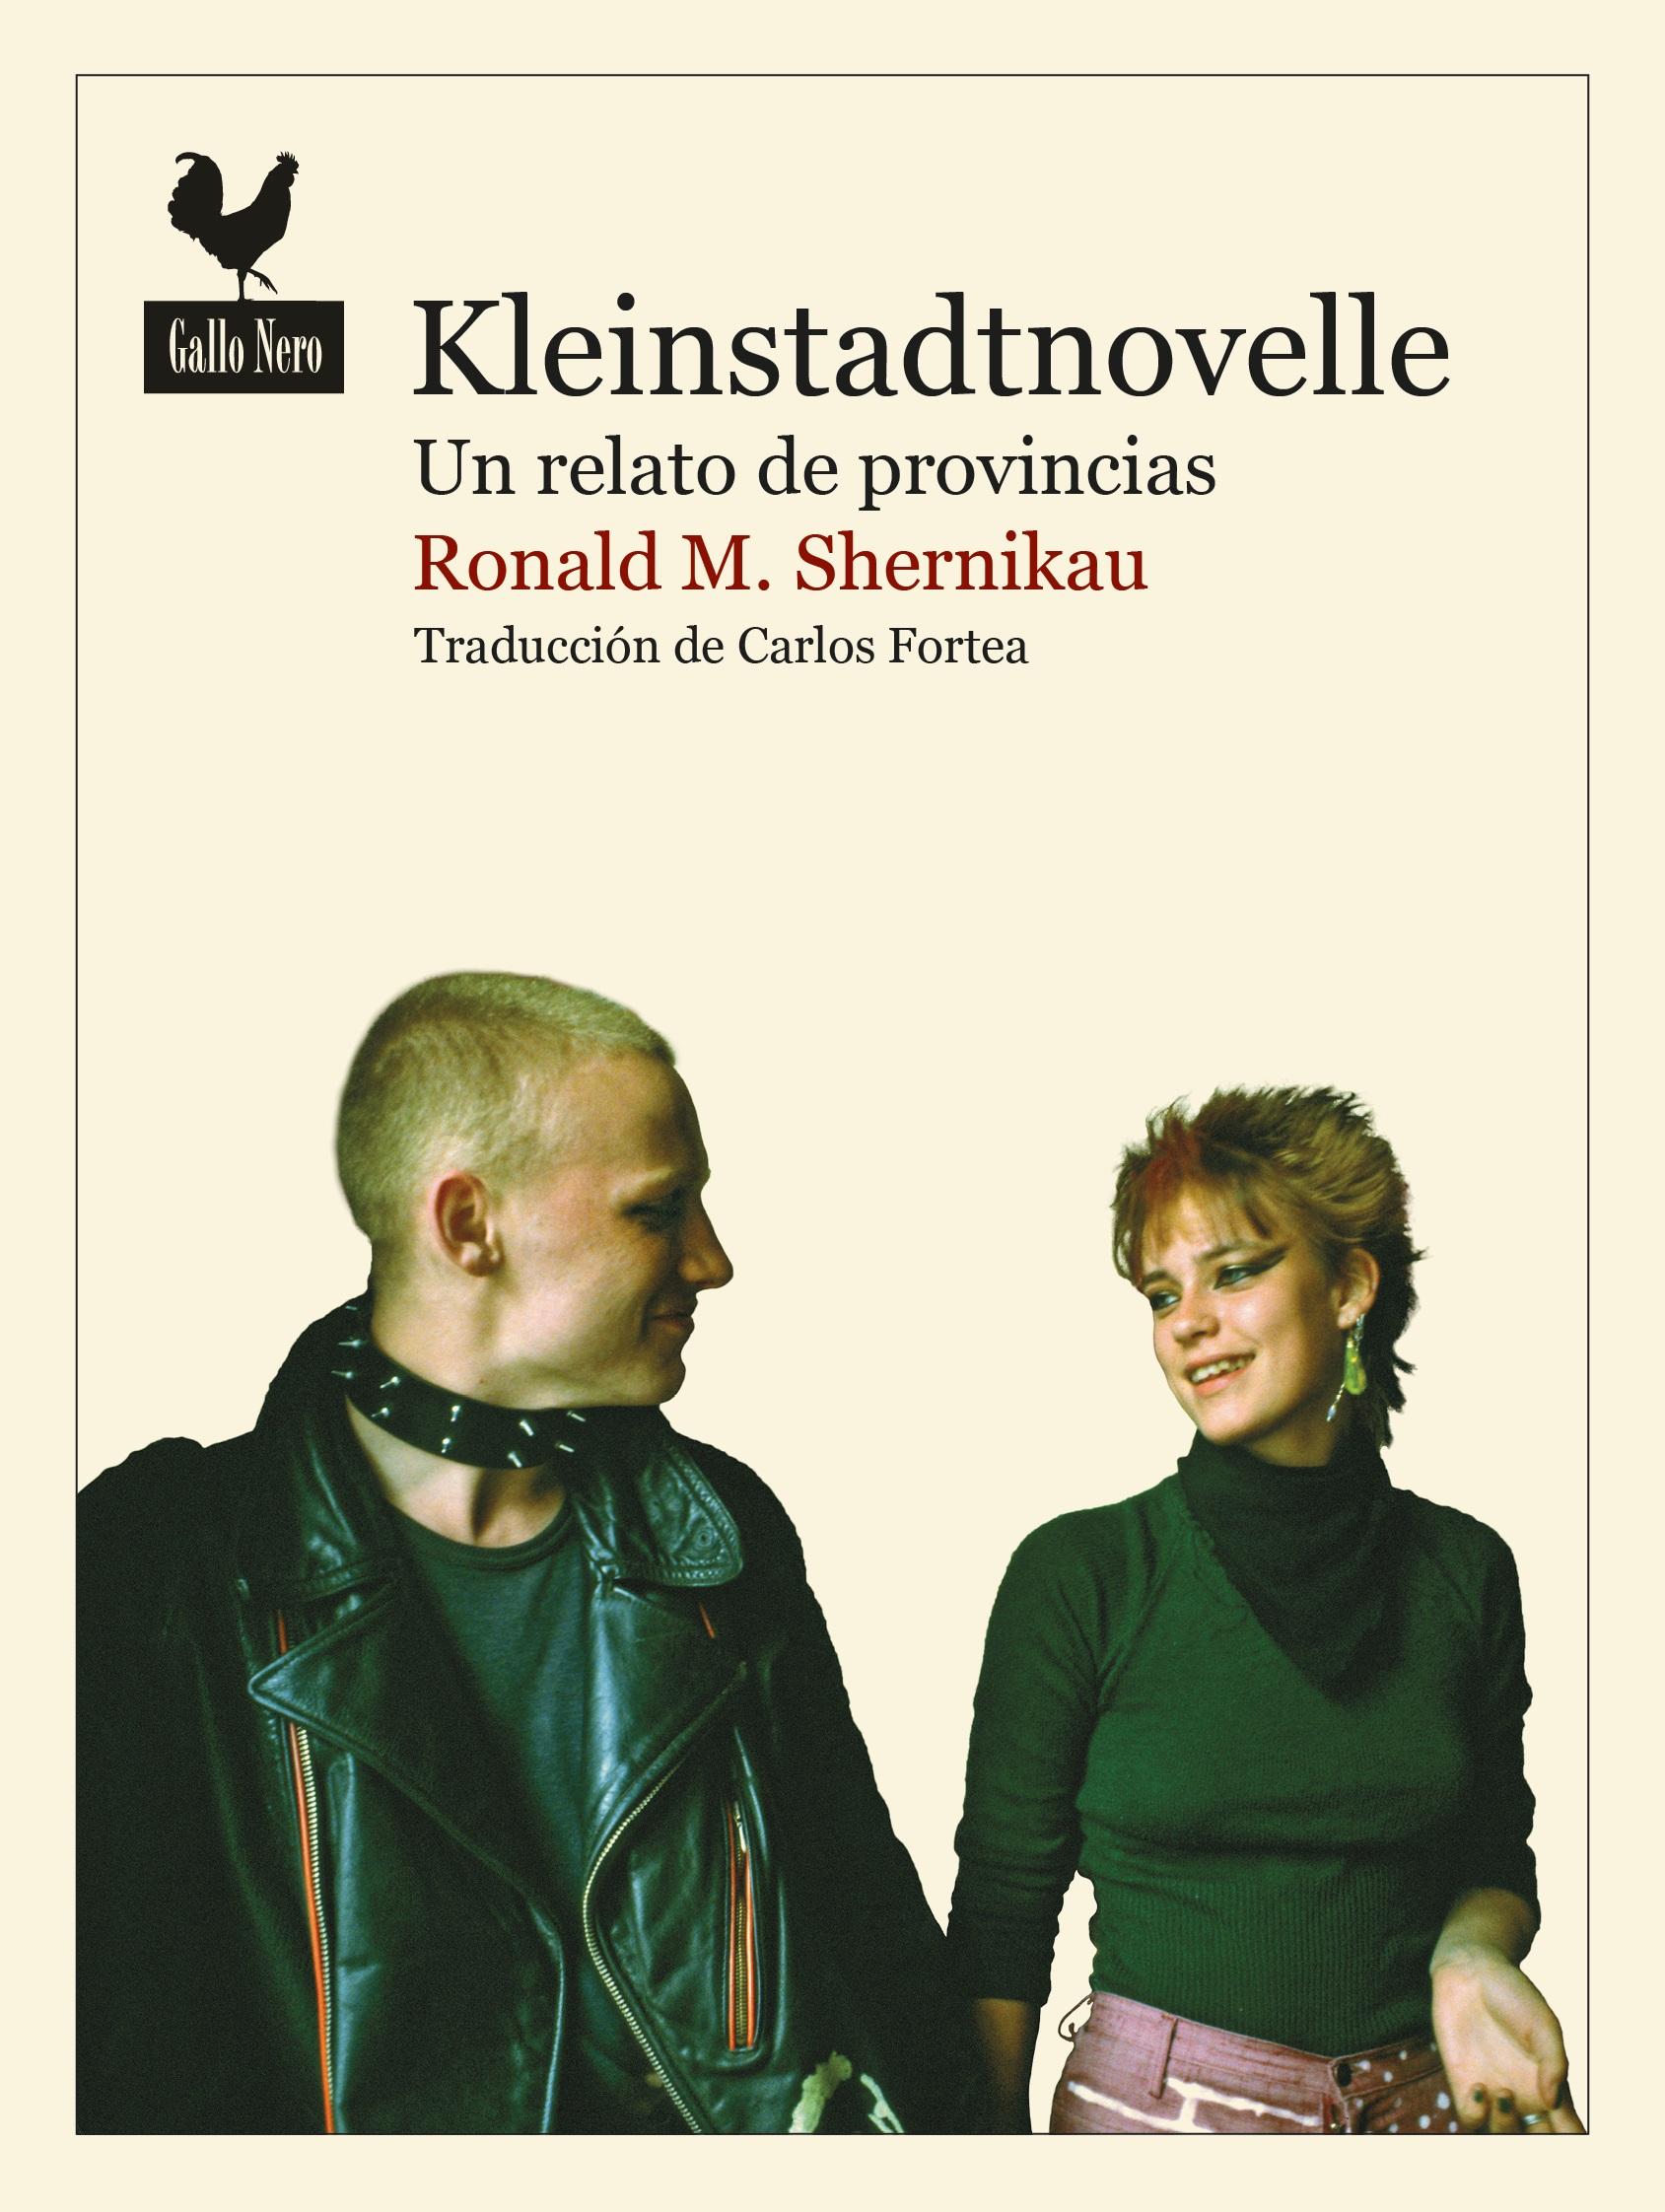 Portada del libro «Kleinstadtnovelle», de Ronald M. Schernikau